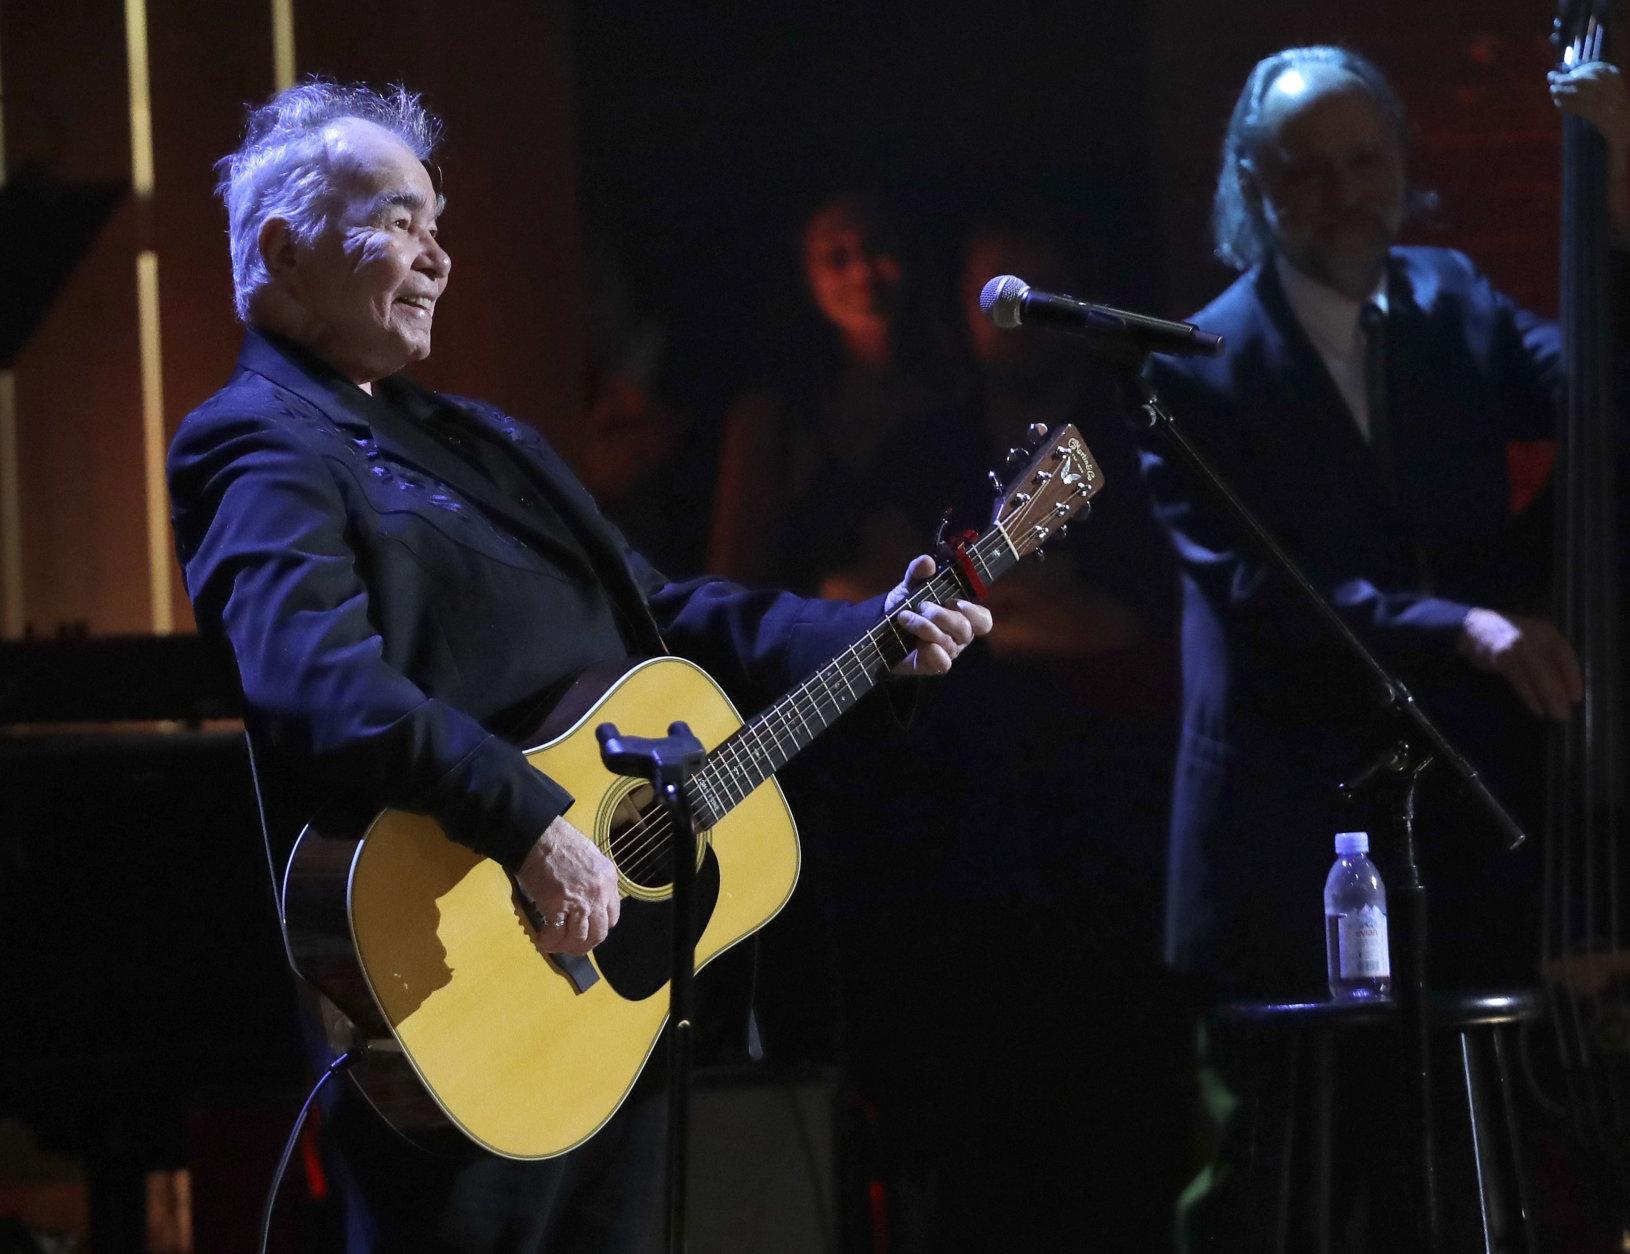 John Prine performs during the Americana Honors and Awards show, Wednesday, Sept. 12, 2018, in Nashville, Tenn. (AP Photo/Mark Zaleski)